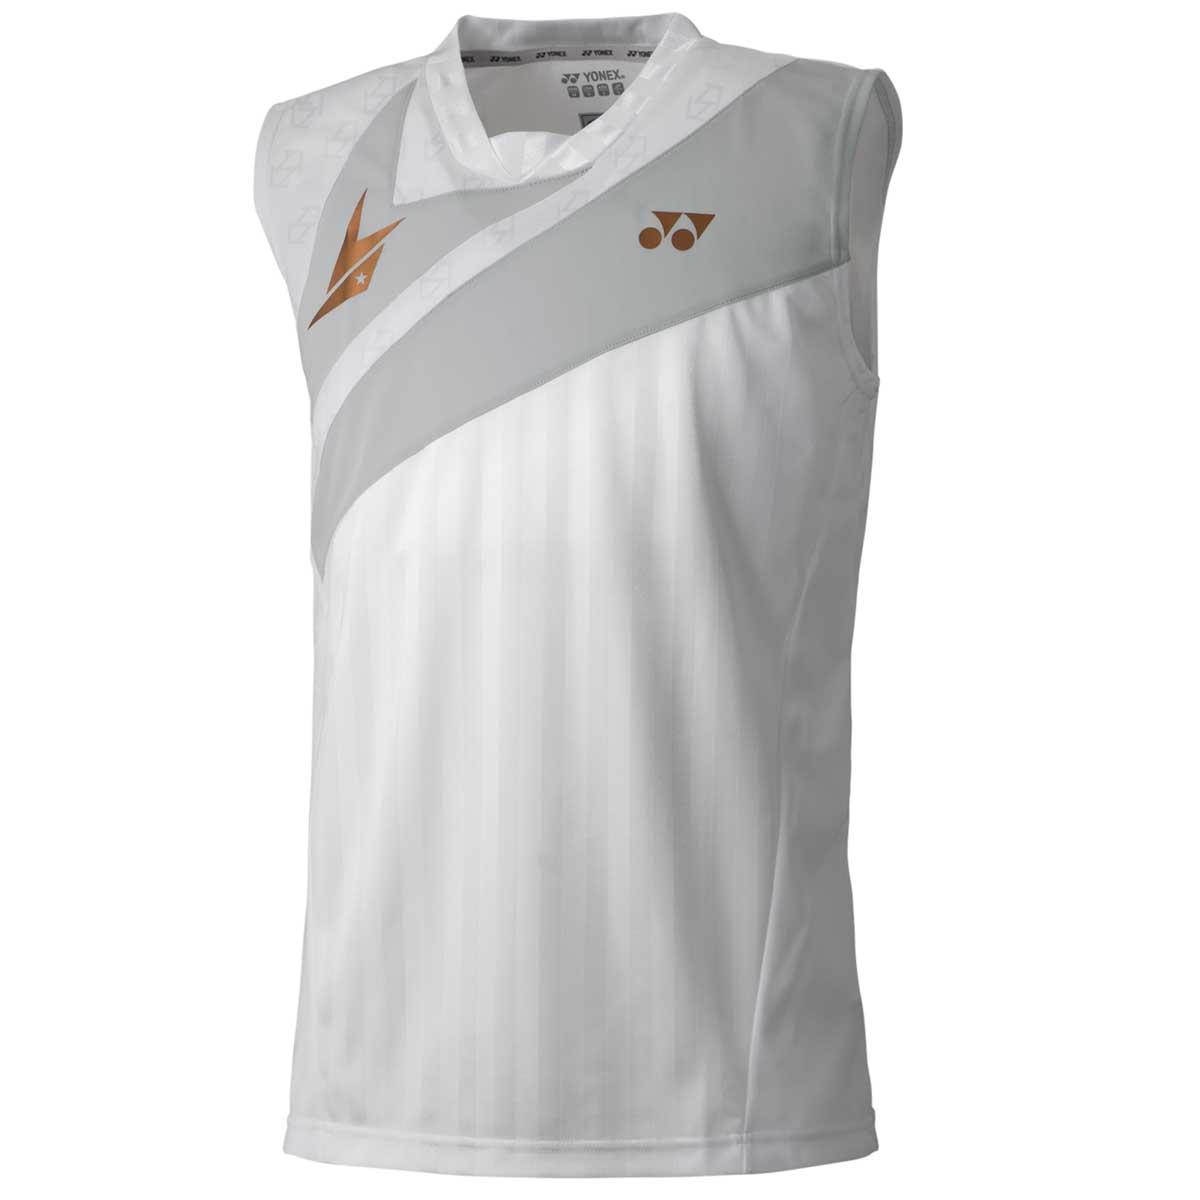 82f717511cb1a Buy Yonex Lin Dan Men s Sleeveless Shirt (White) Online India